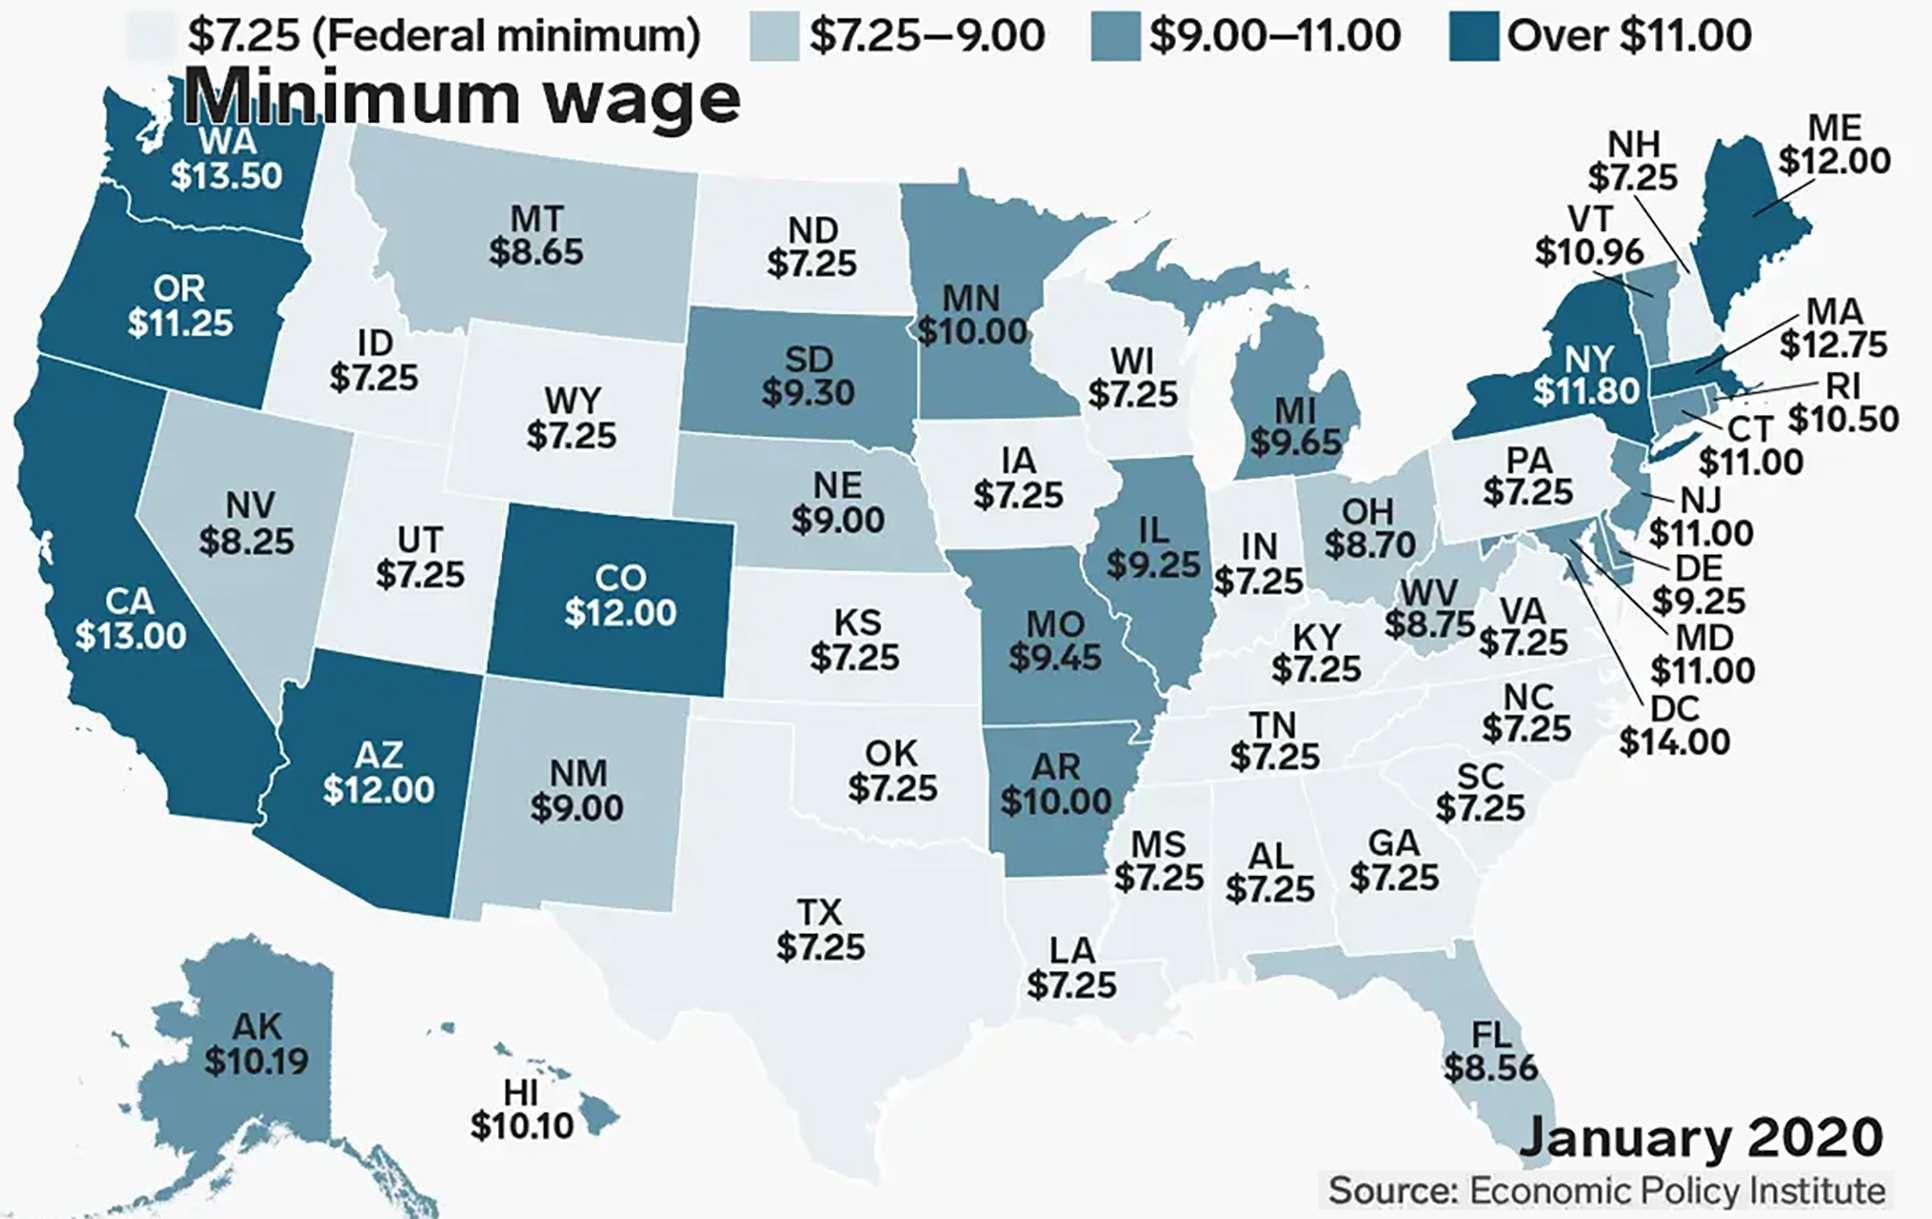 USA ΗΠΑ κατώτατο ωρομίσθιο Minimum wage 2020